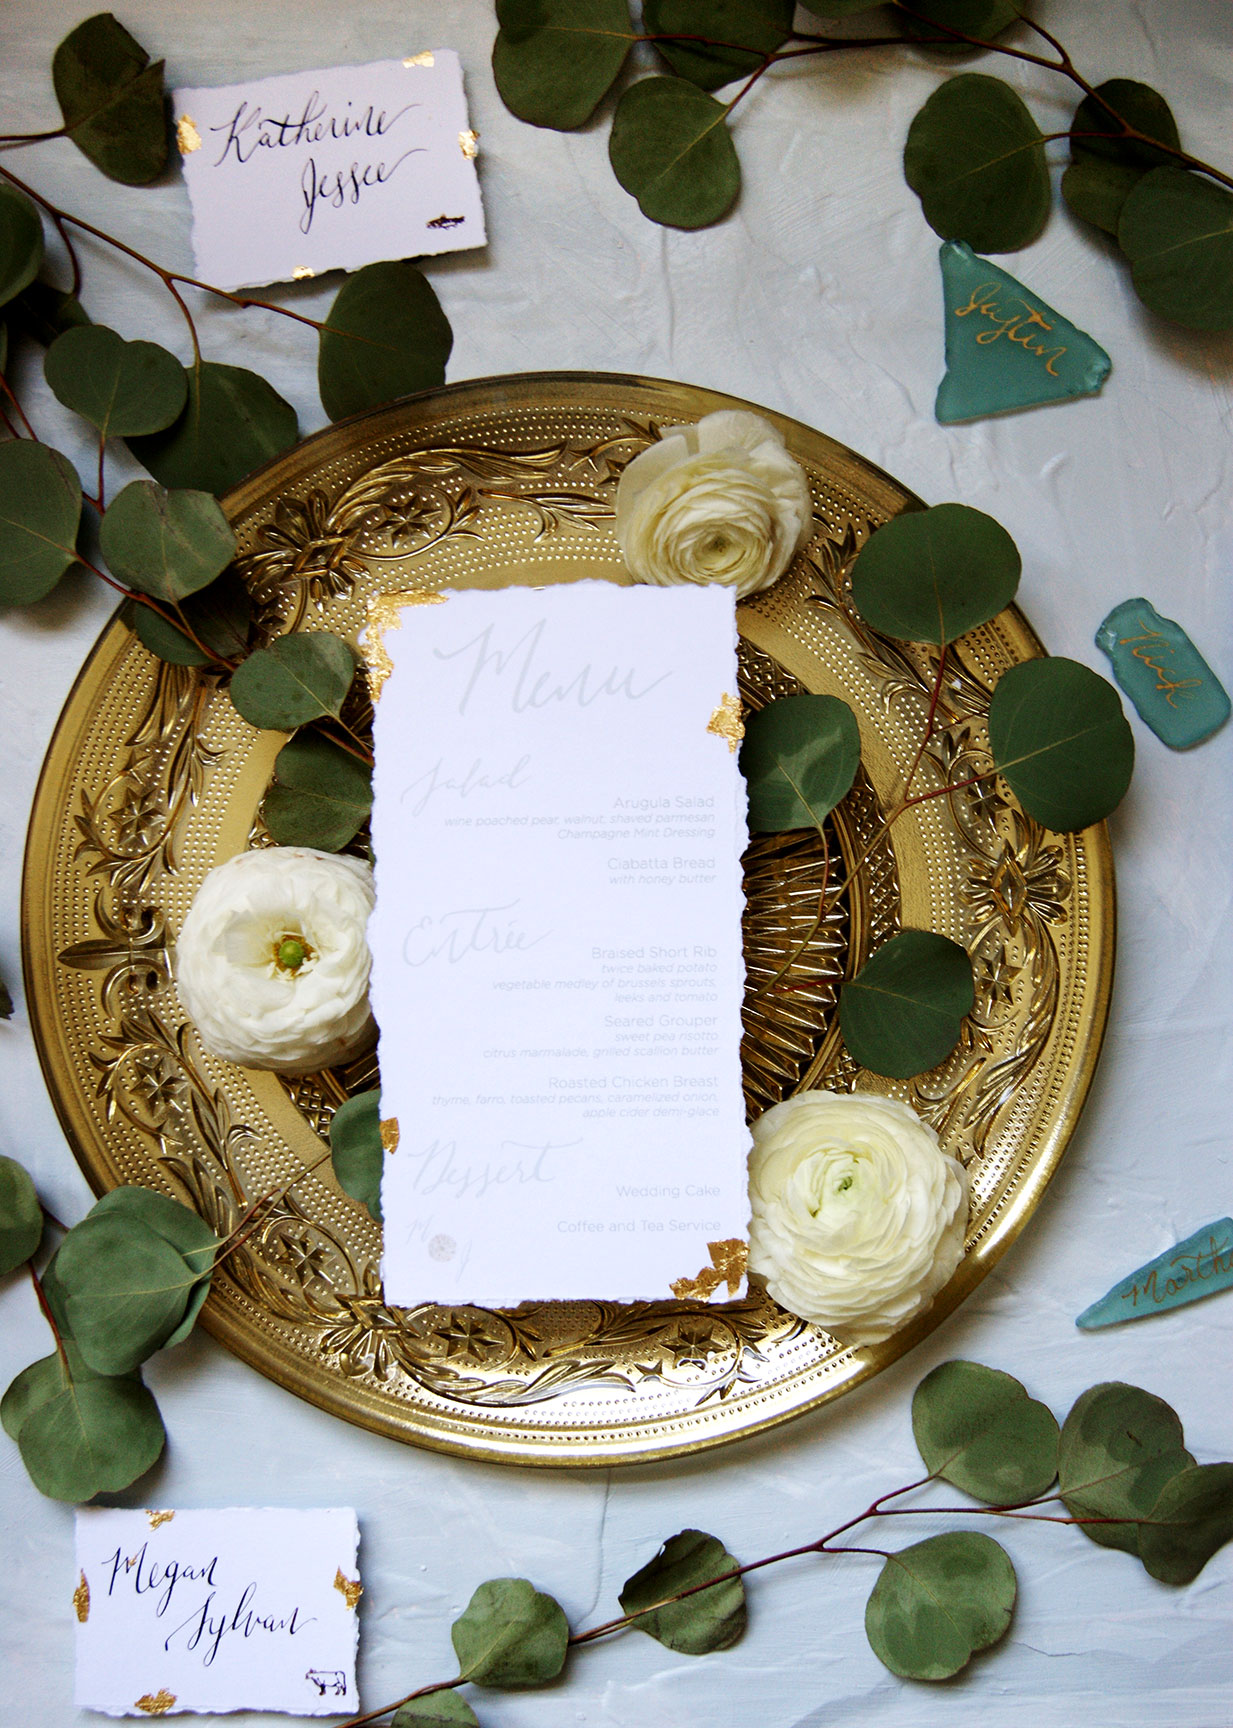 Kiawah Island Wedding Day Paper Goods